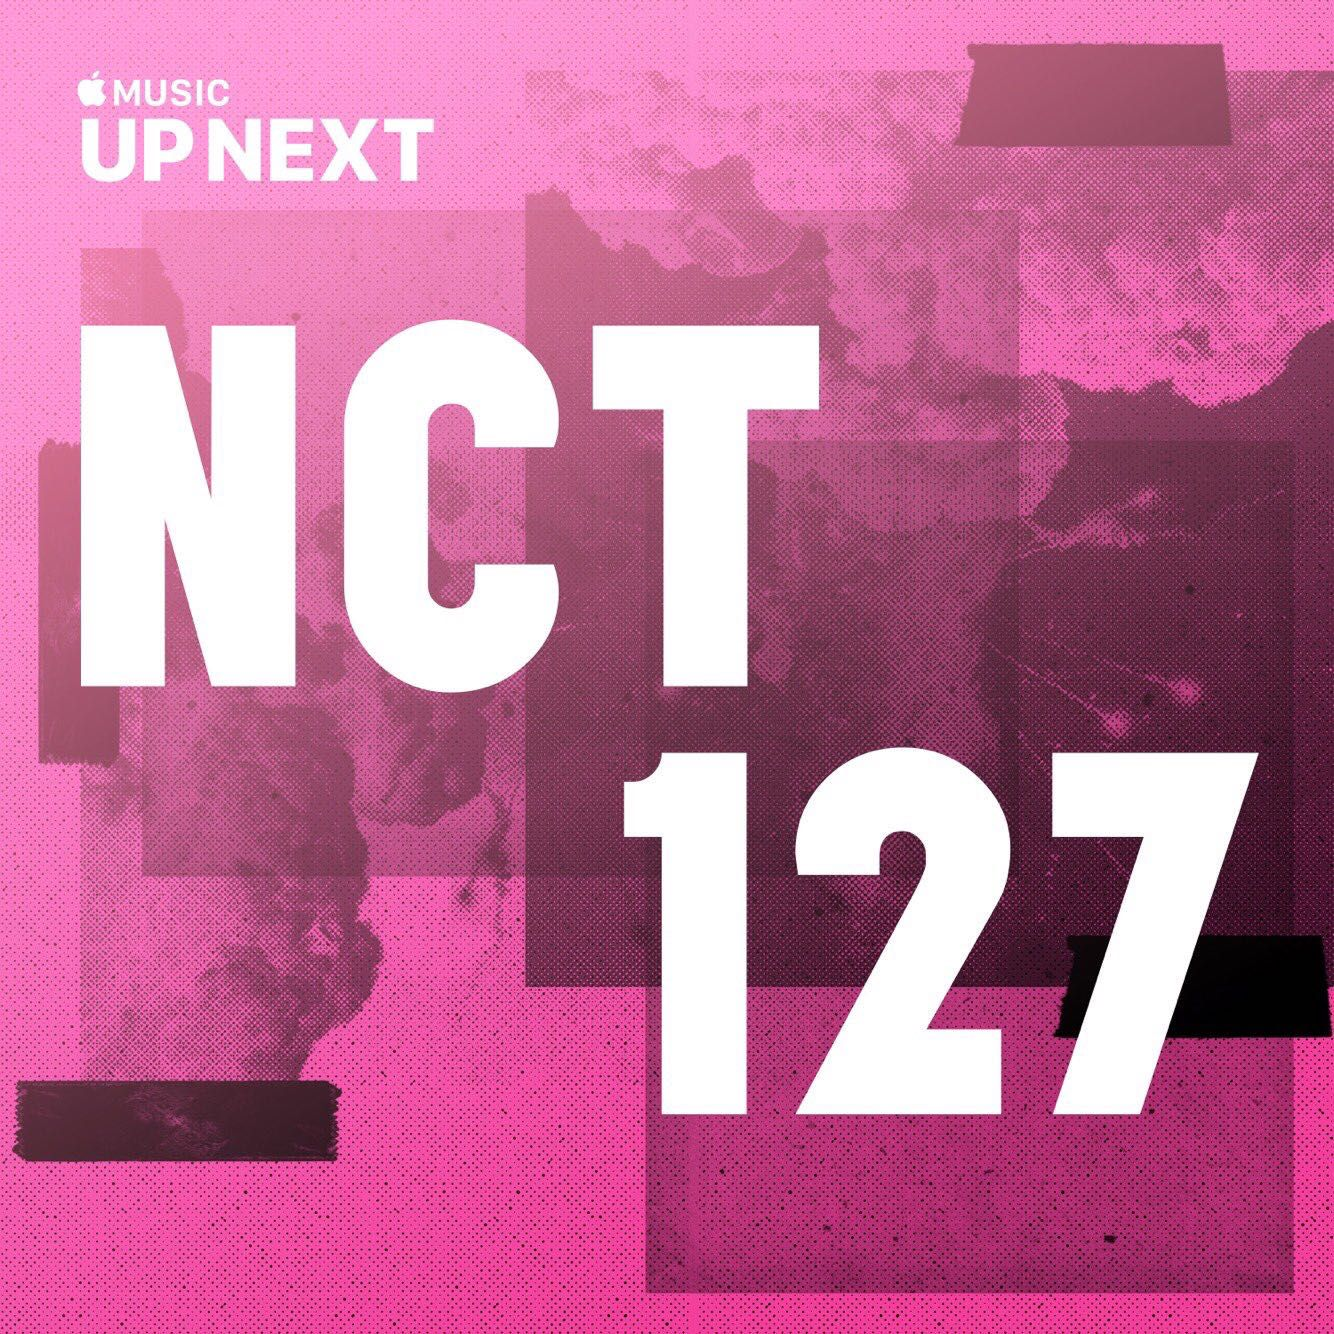 NCT LYRICS - Up Next Session (EP) by NCT 127 - Wattpad